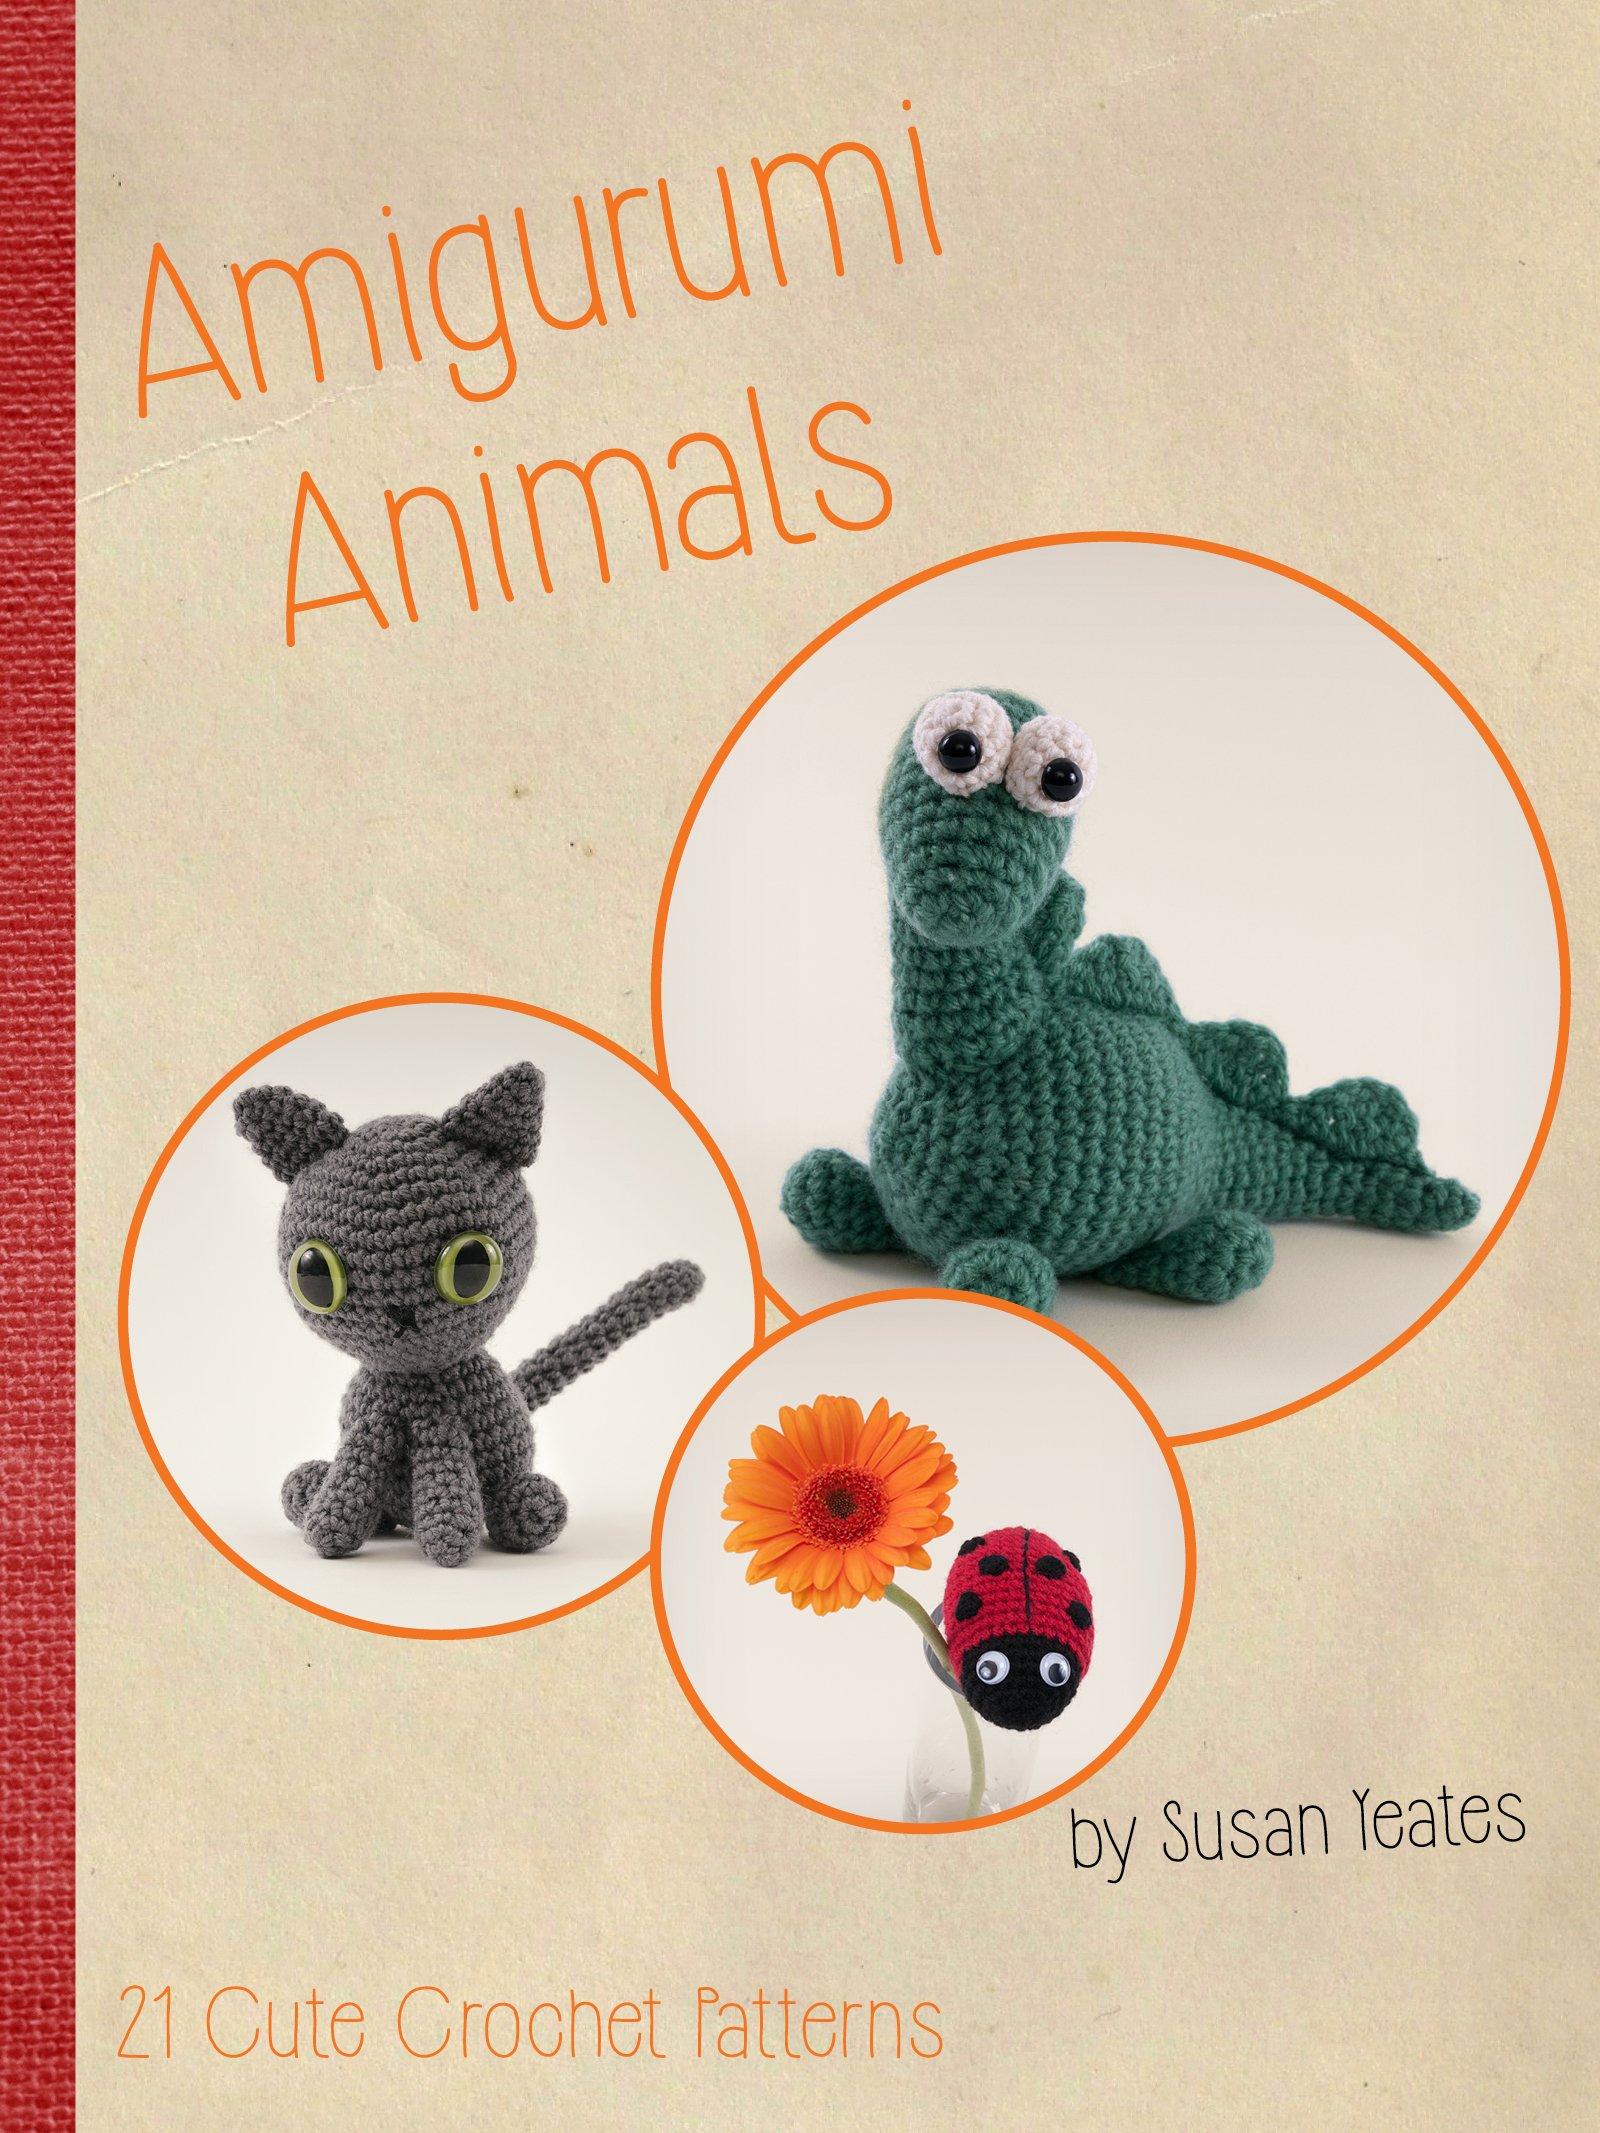 Amigurumi Animals  21 Cute Crochet Patterns  English Edition